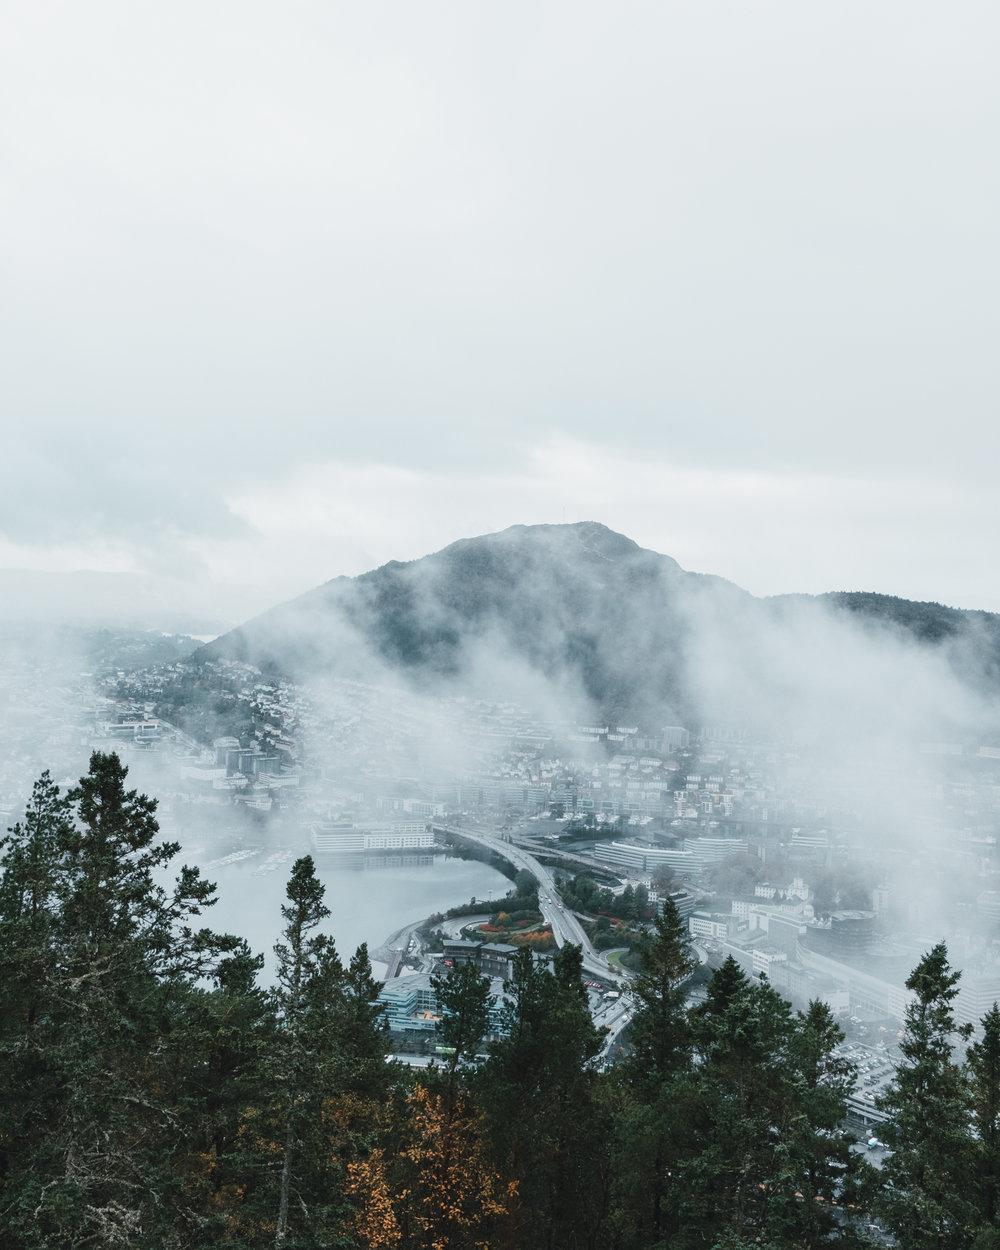 bergen+norge